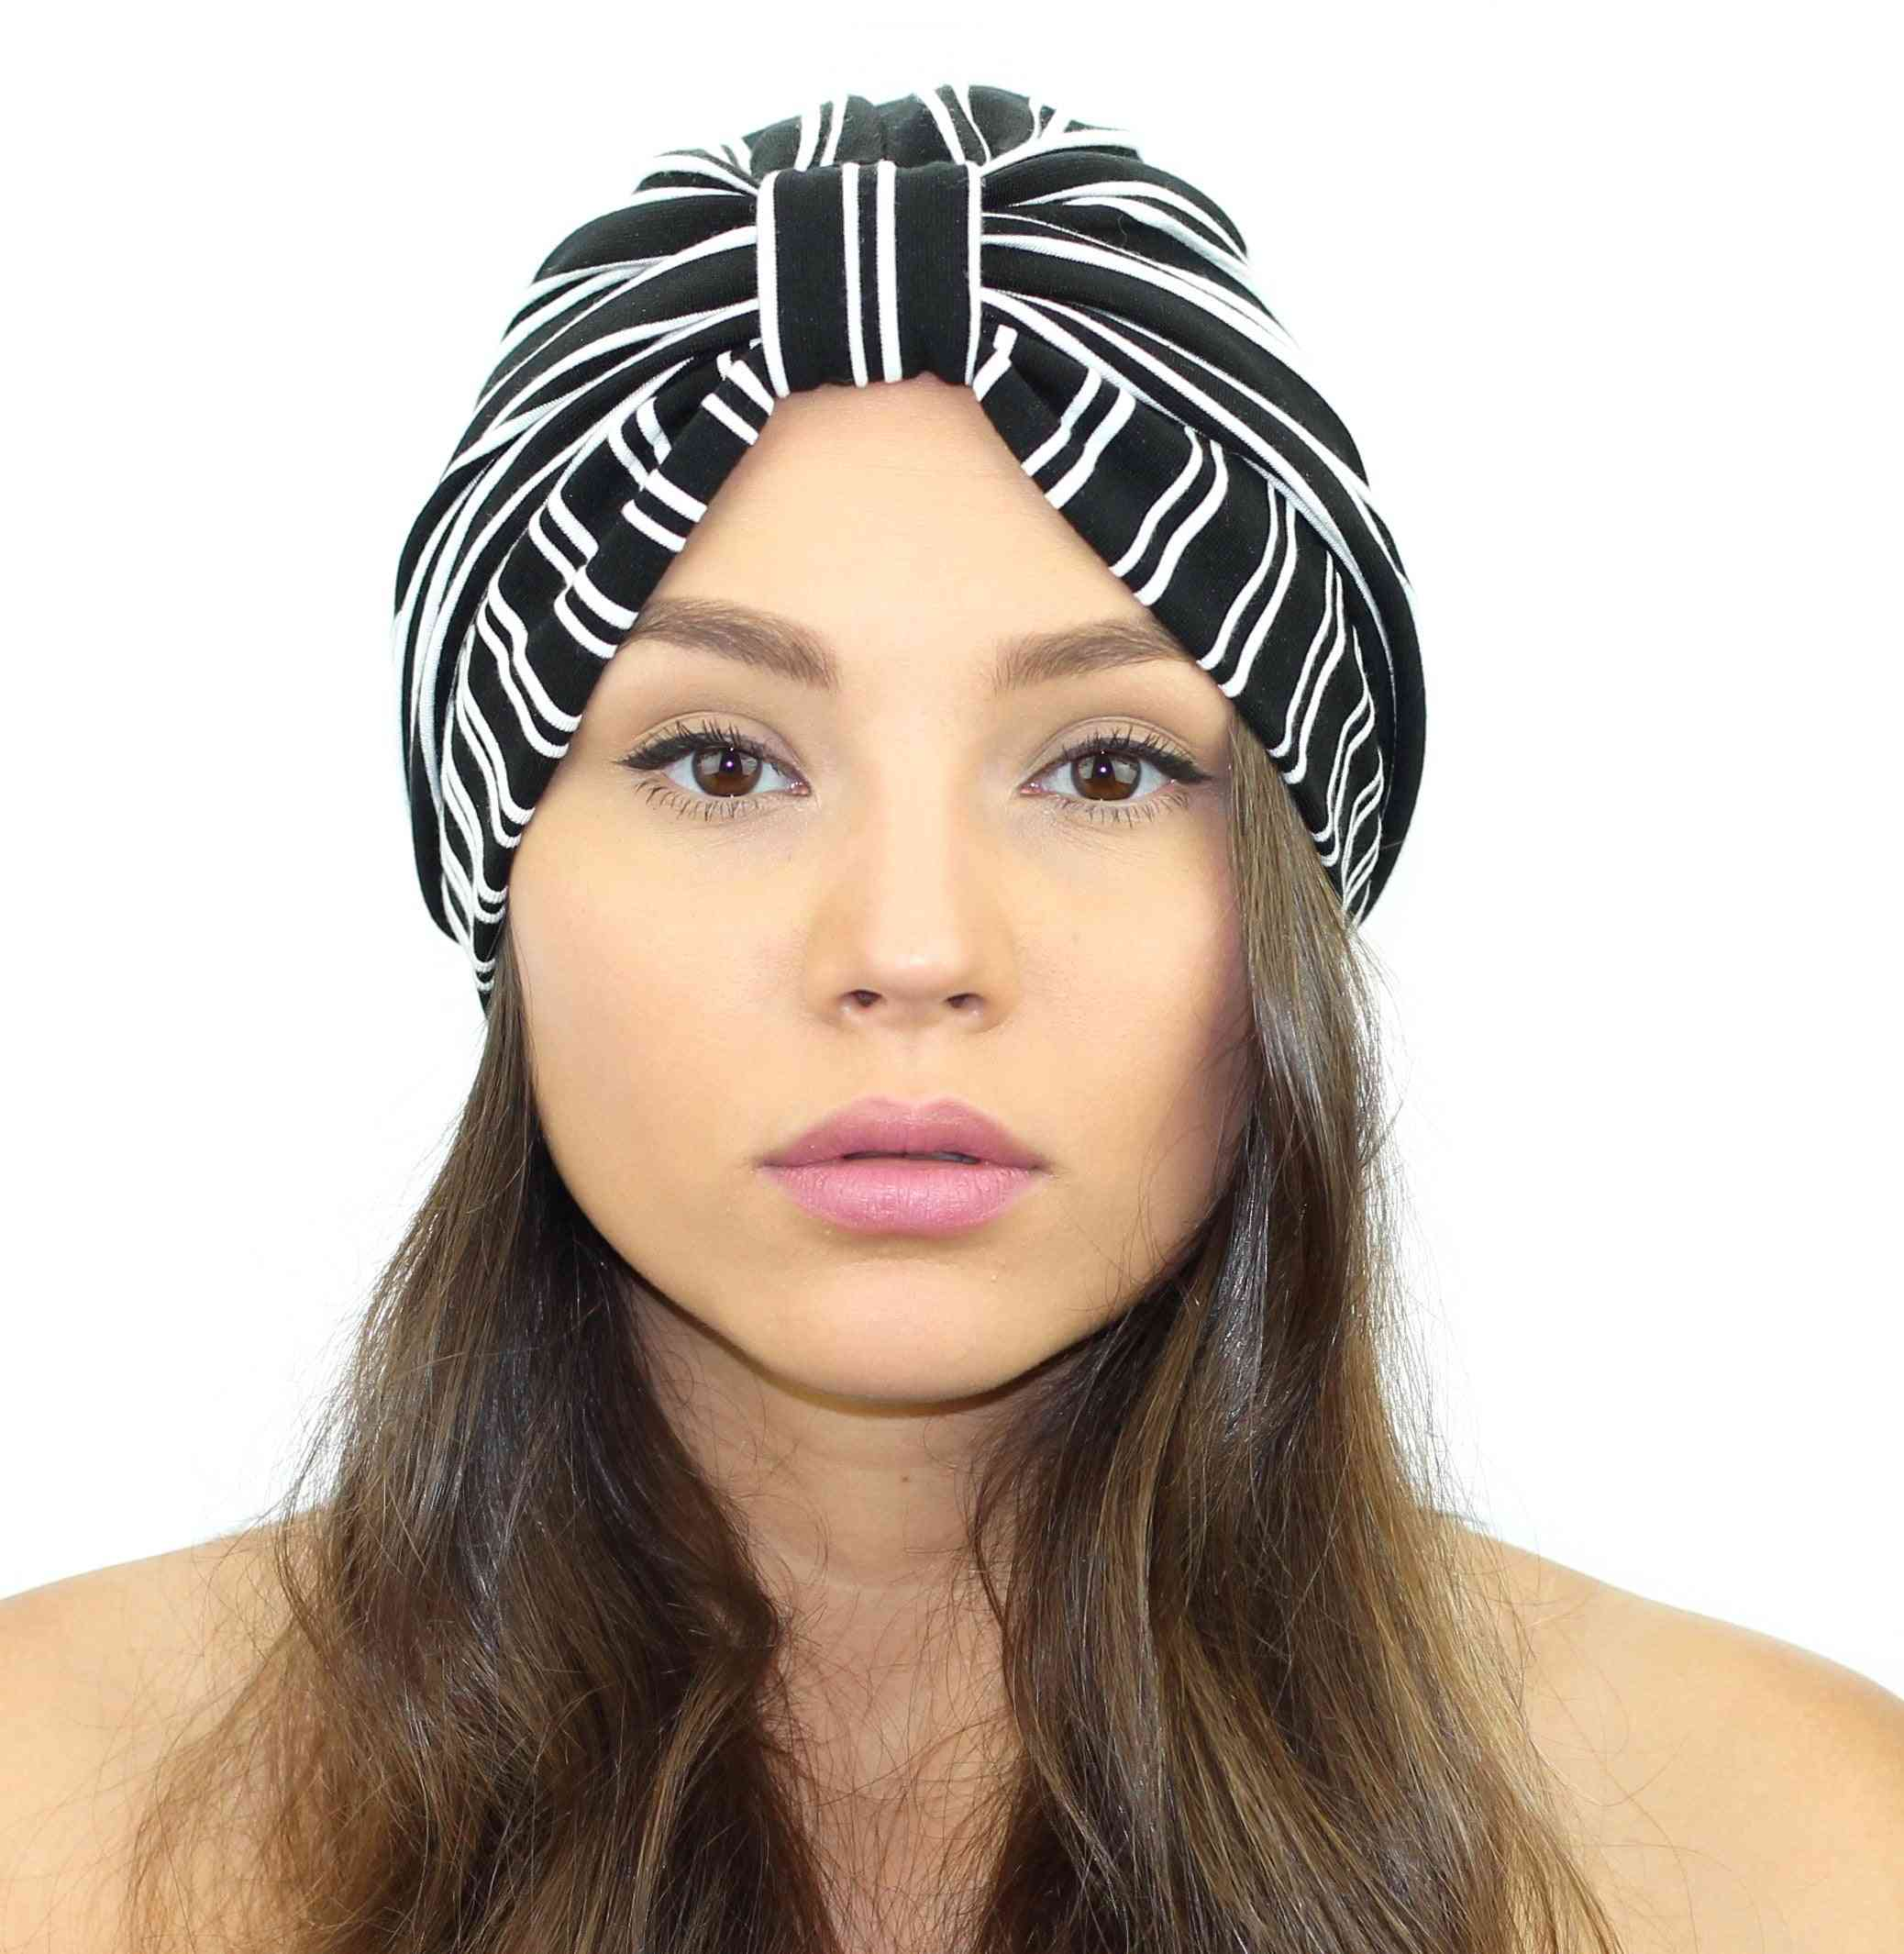 Pinstripe Turban Headband